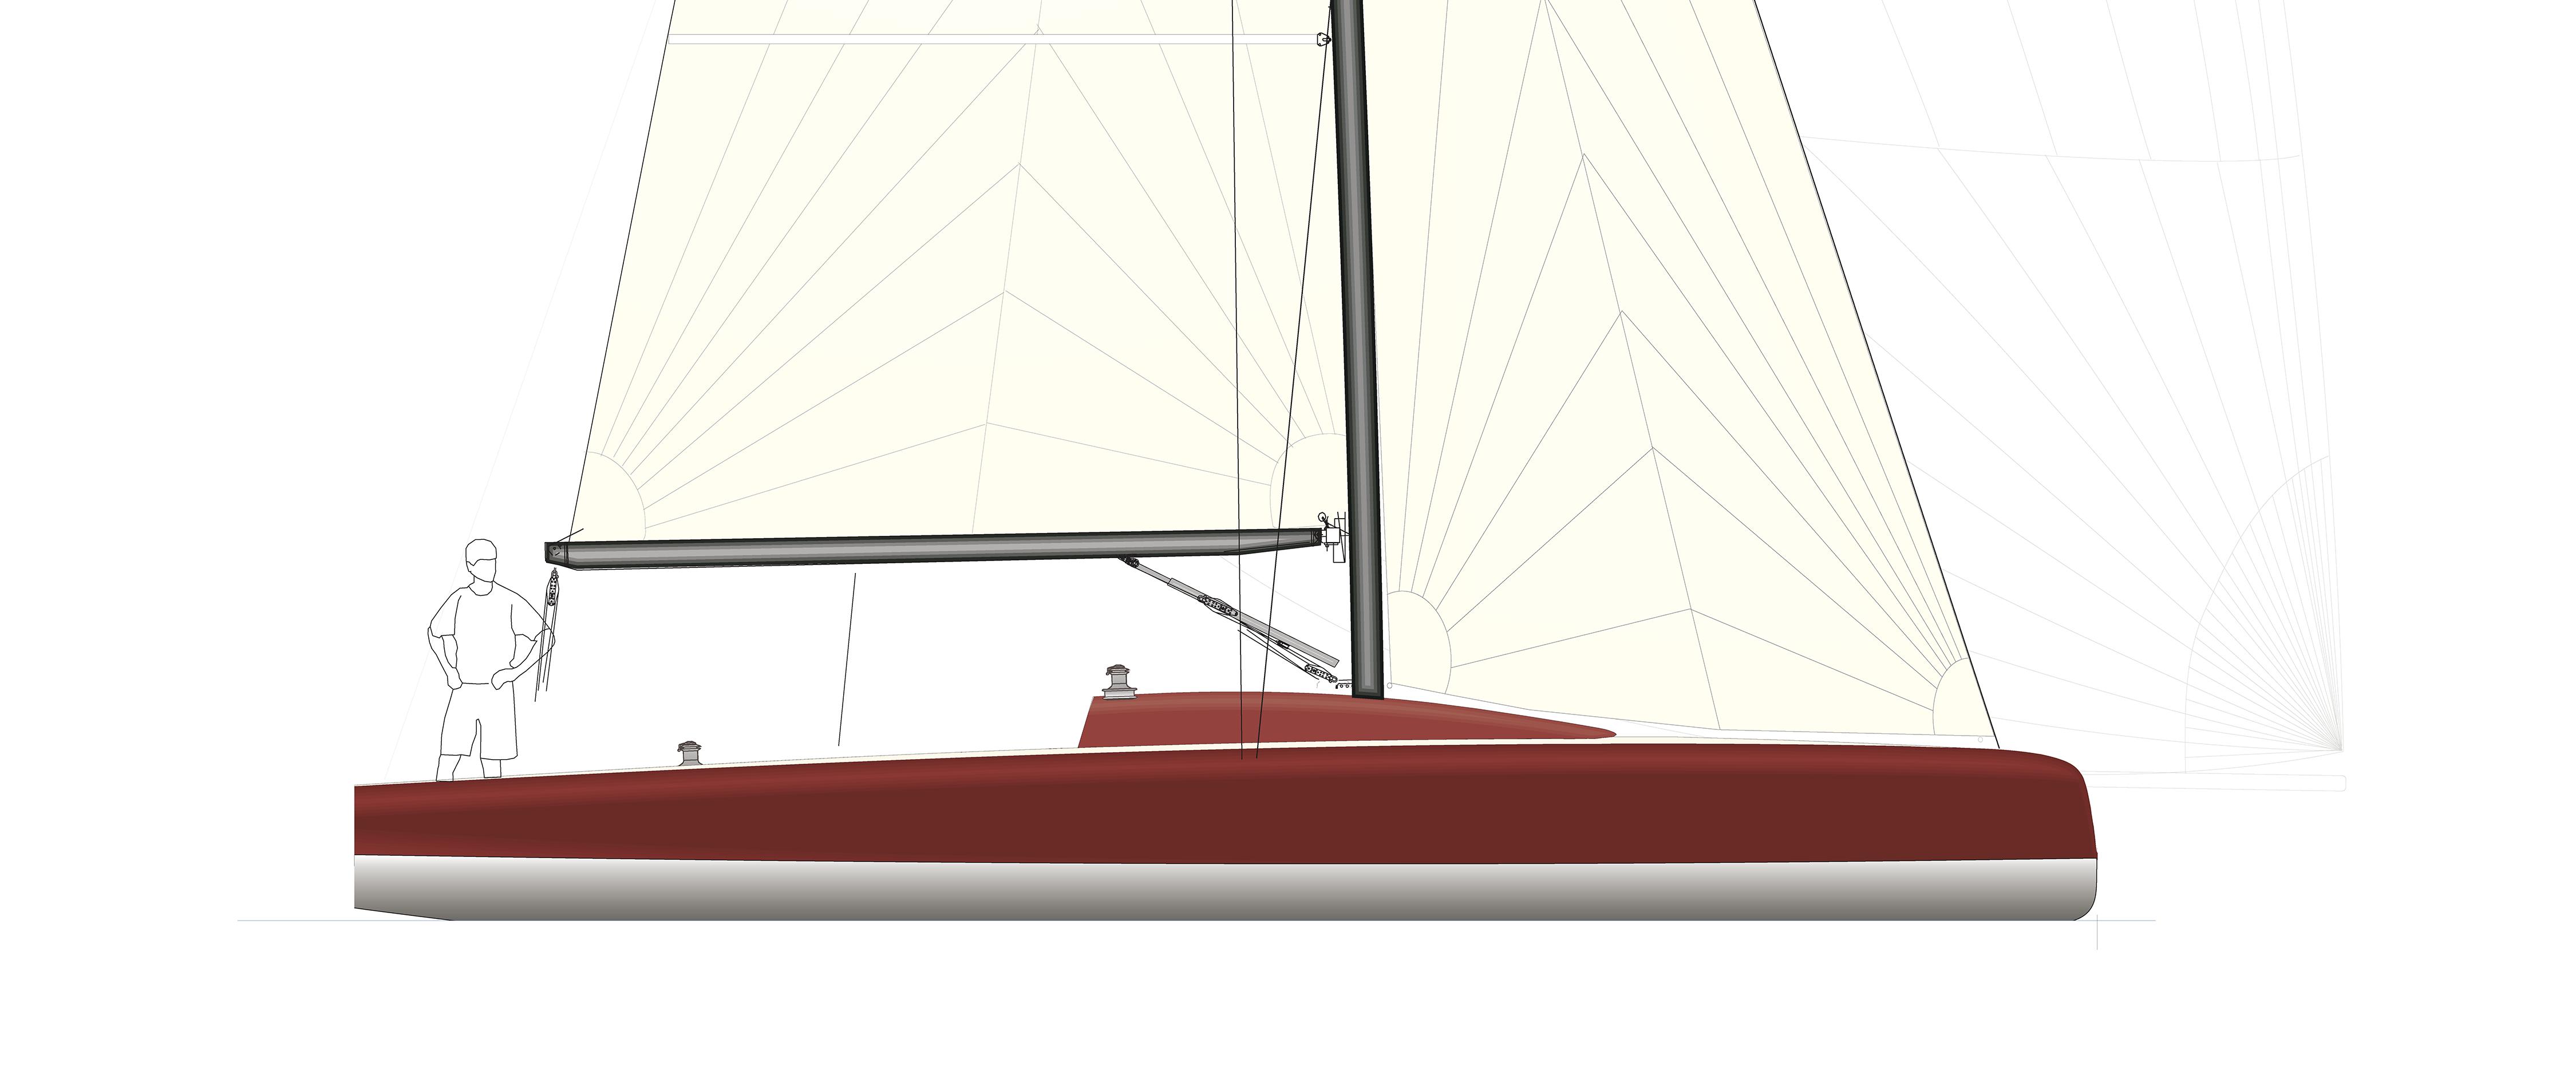 Moderne segelyachten  Segelyacht LA 35 - LA Yacht- & Bootsbau GmbH